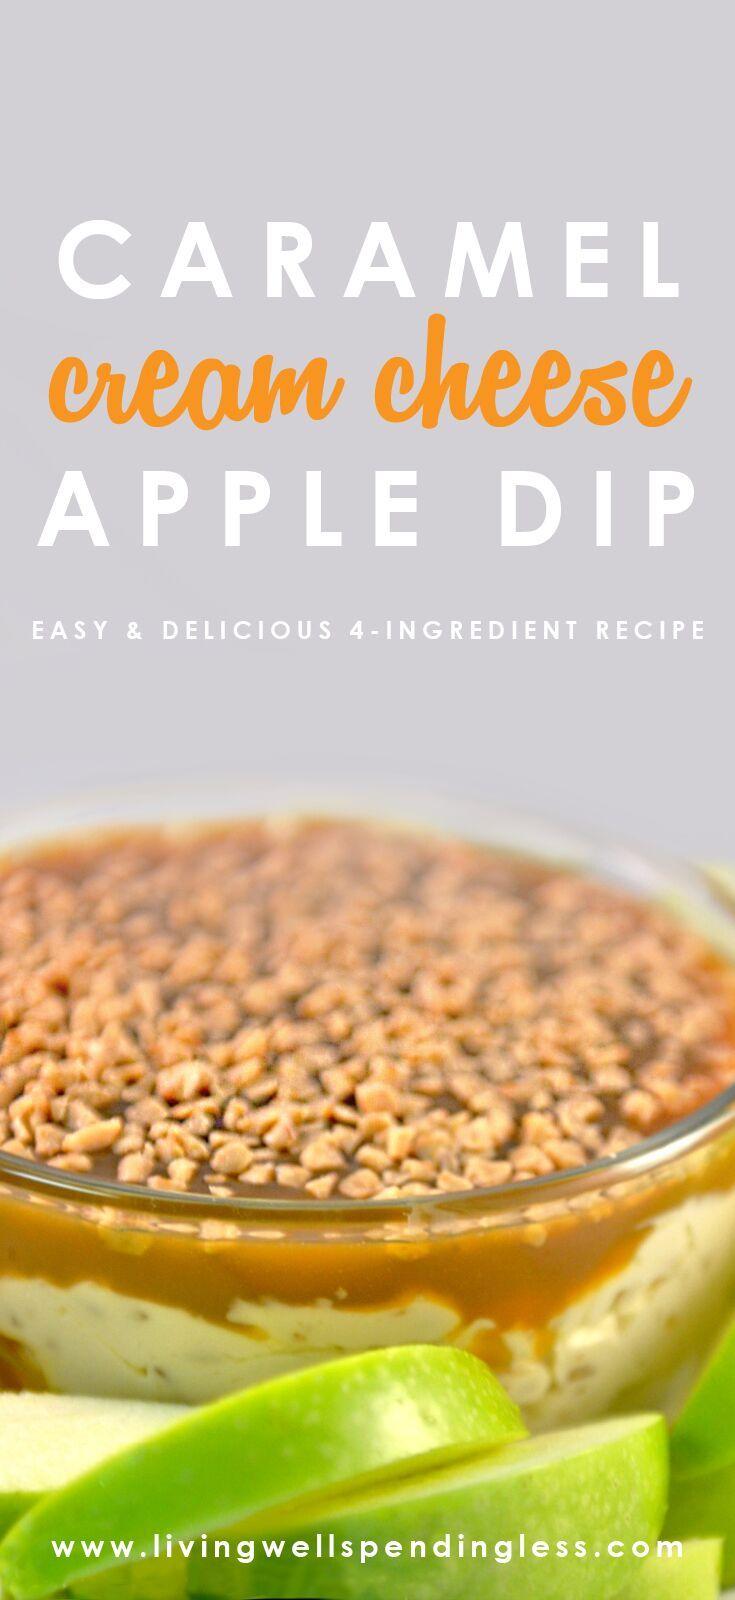 Easy Caramel Cream Cheese Apple Dip Recipe   Best Snack Recipes   Fall Dessert Ideas via lwsl